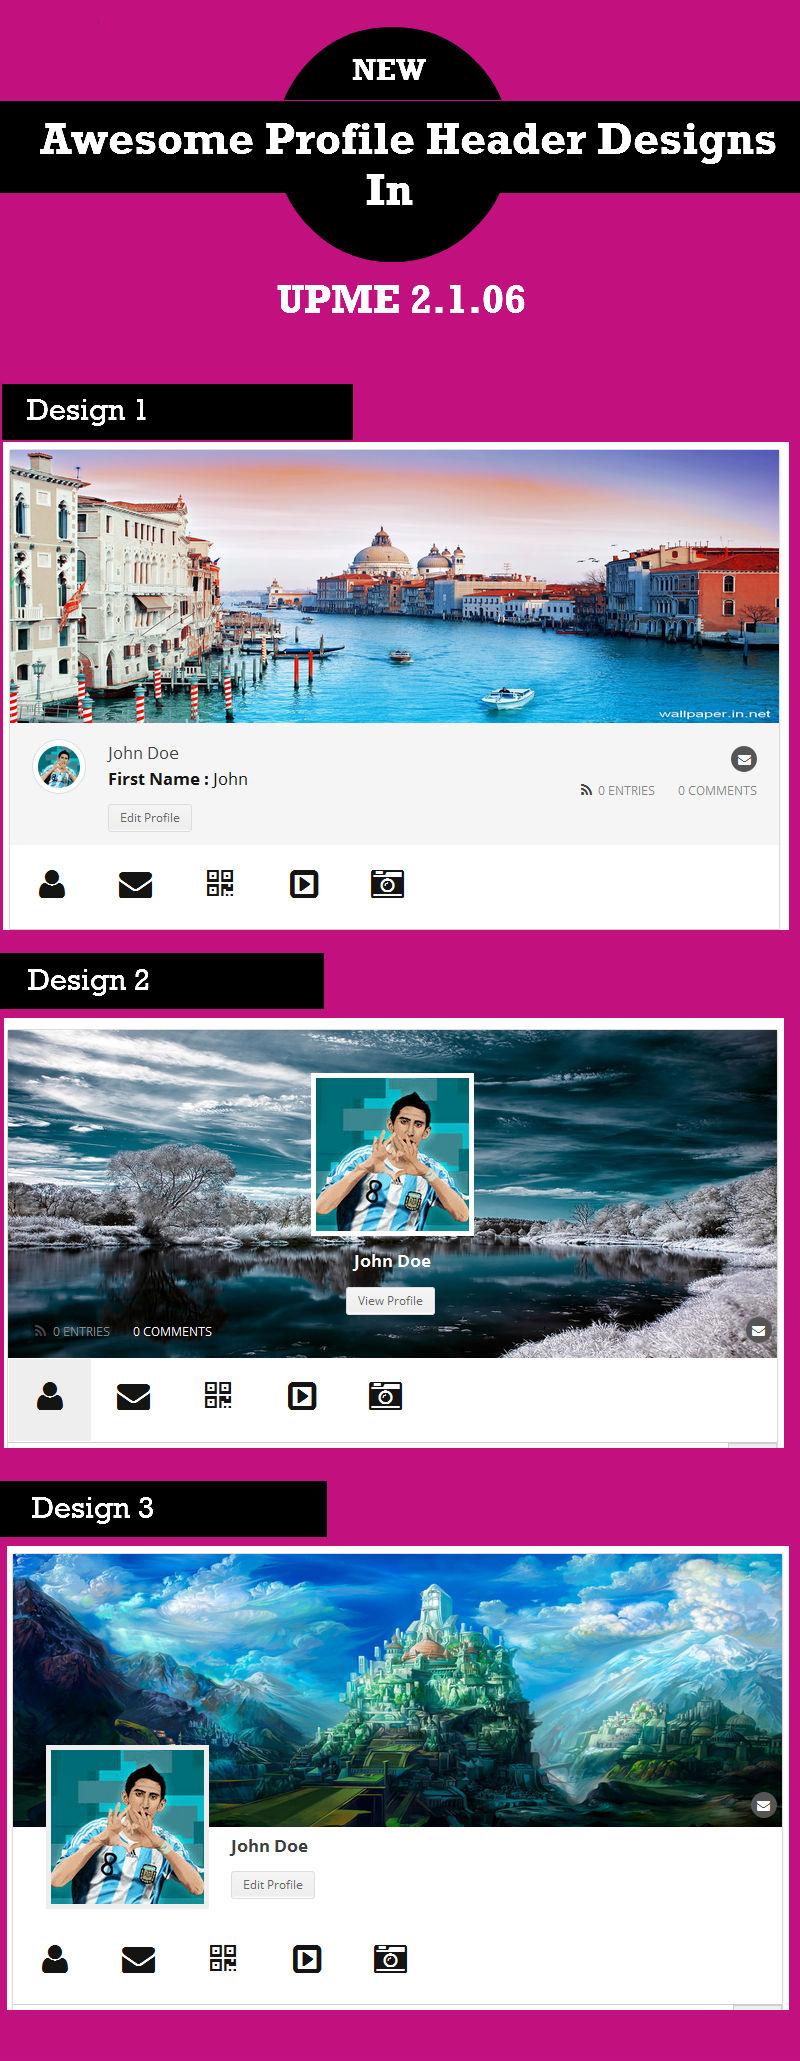 cover_designs_pxd